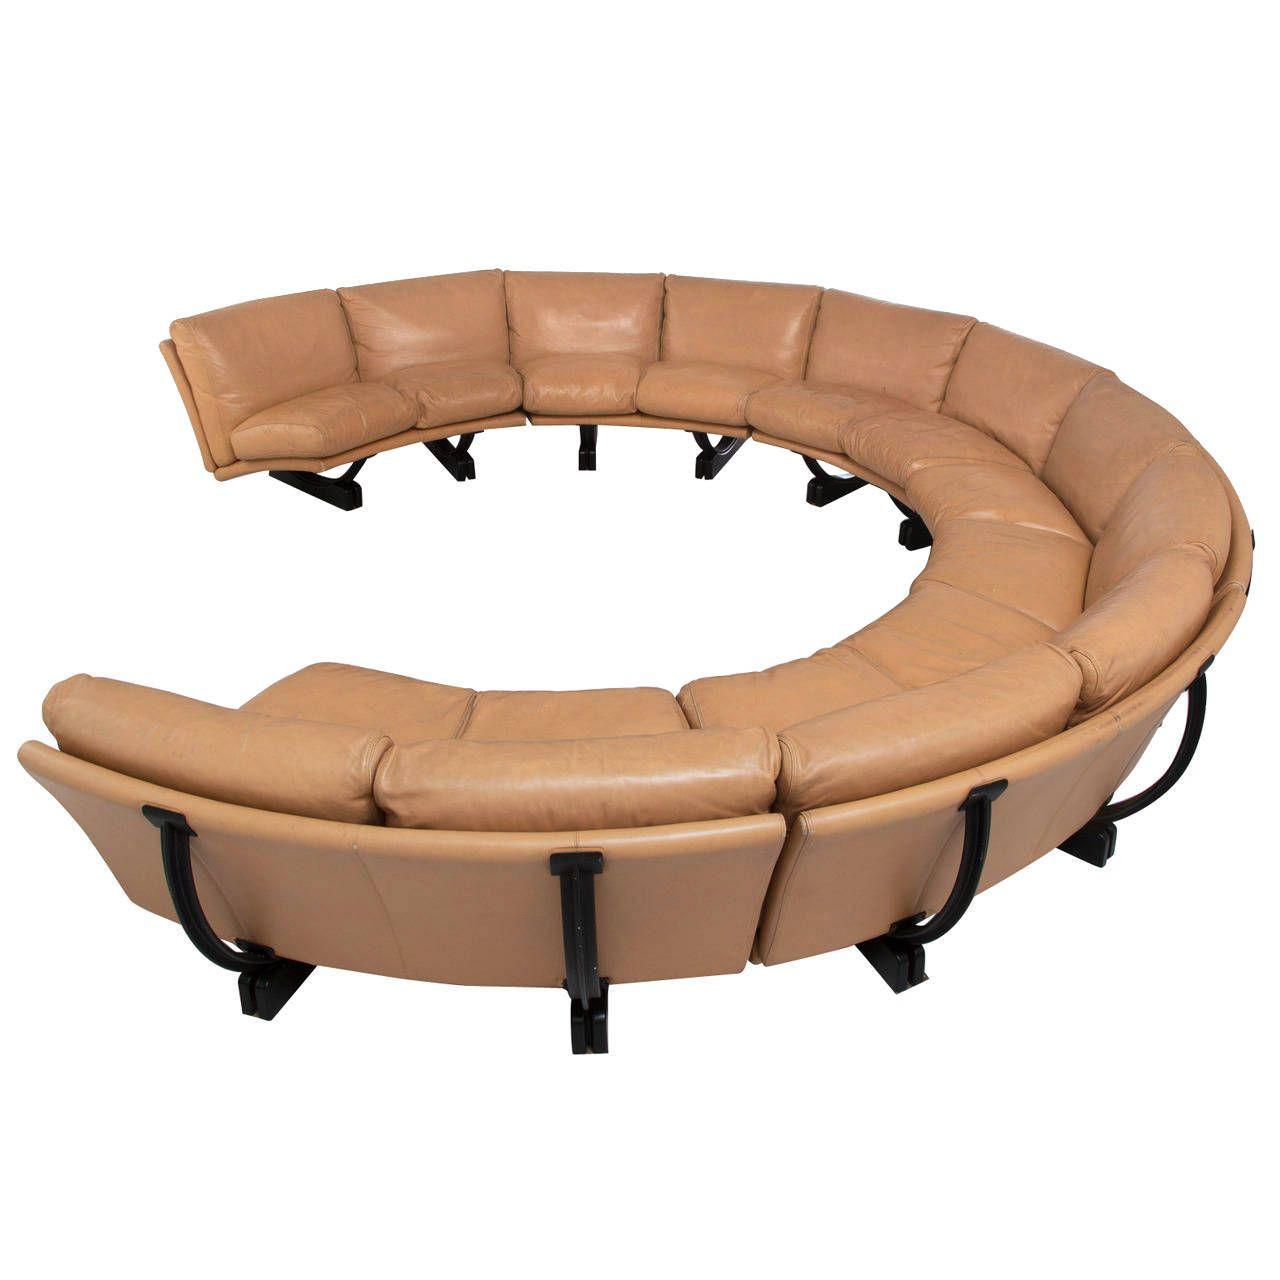 poltrona frau sofa review sack bean bag large curved sectional sofas shapeyourminds